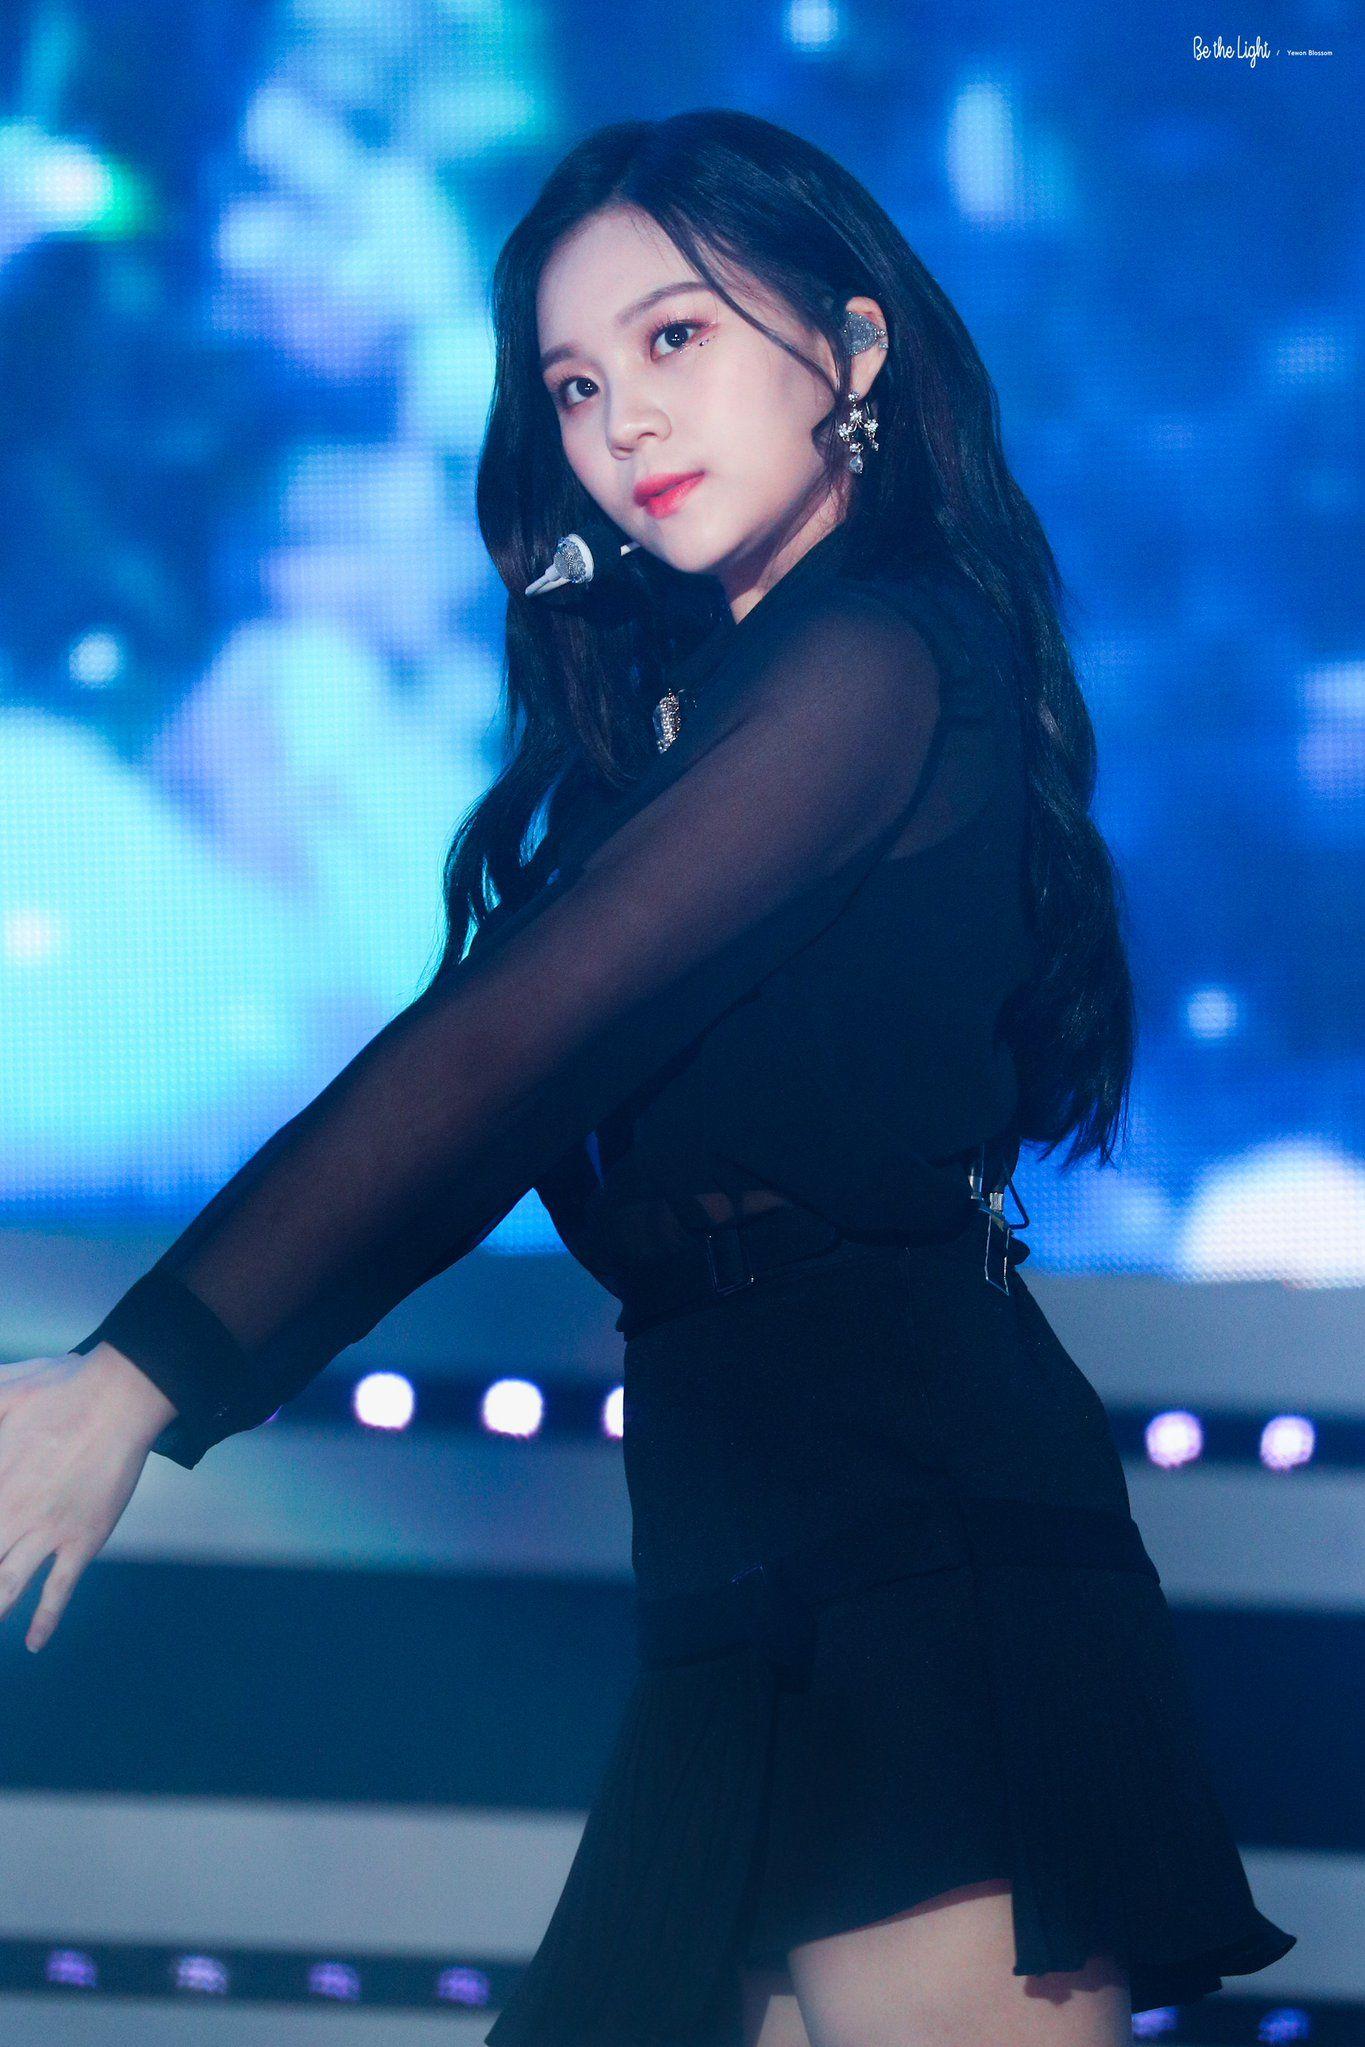 Umji Kpop Kdrama Bts Exo Kpoparmy Kpop Girls Girls Generation Korean Idol